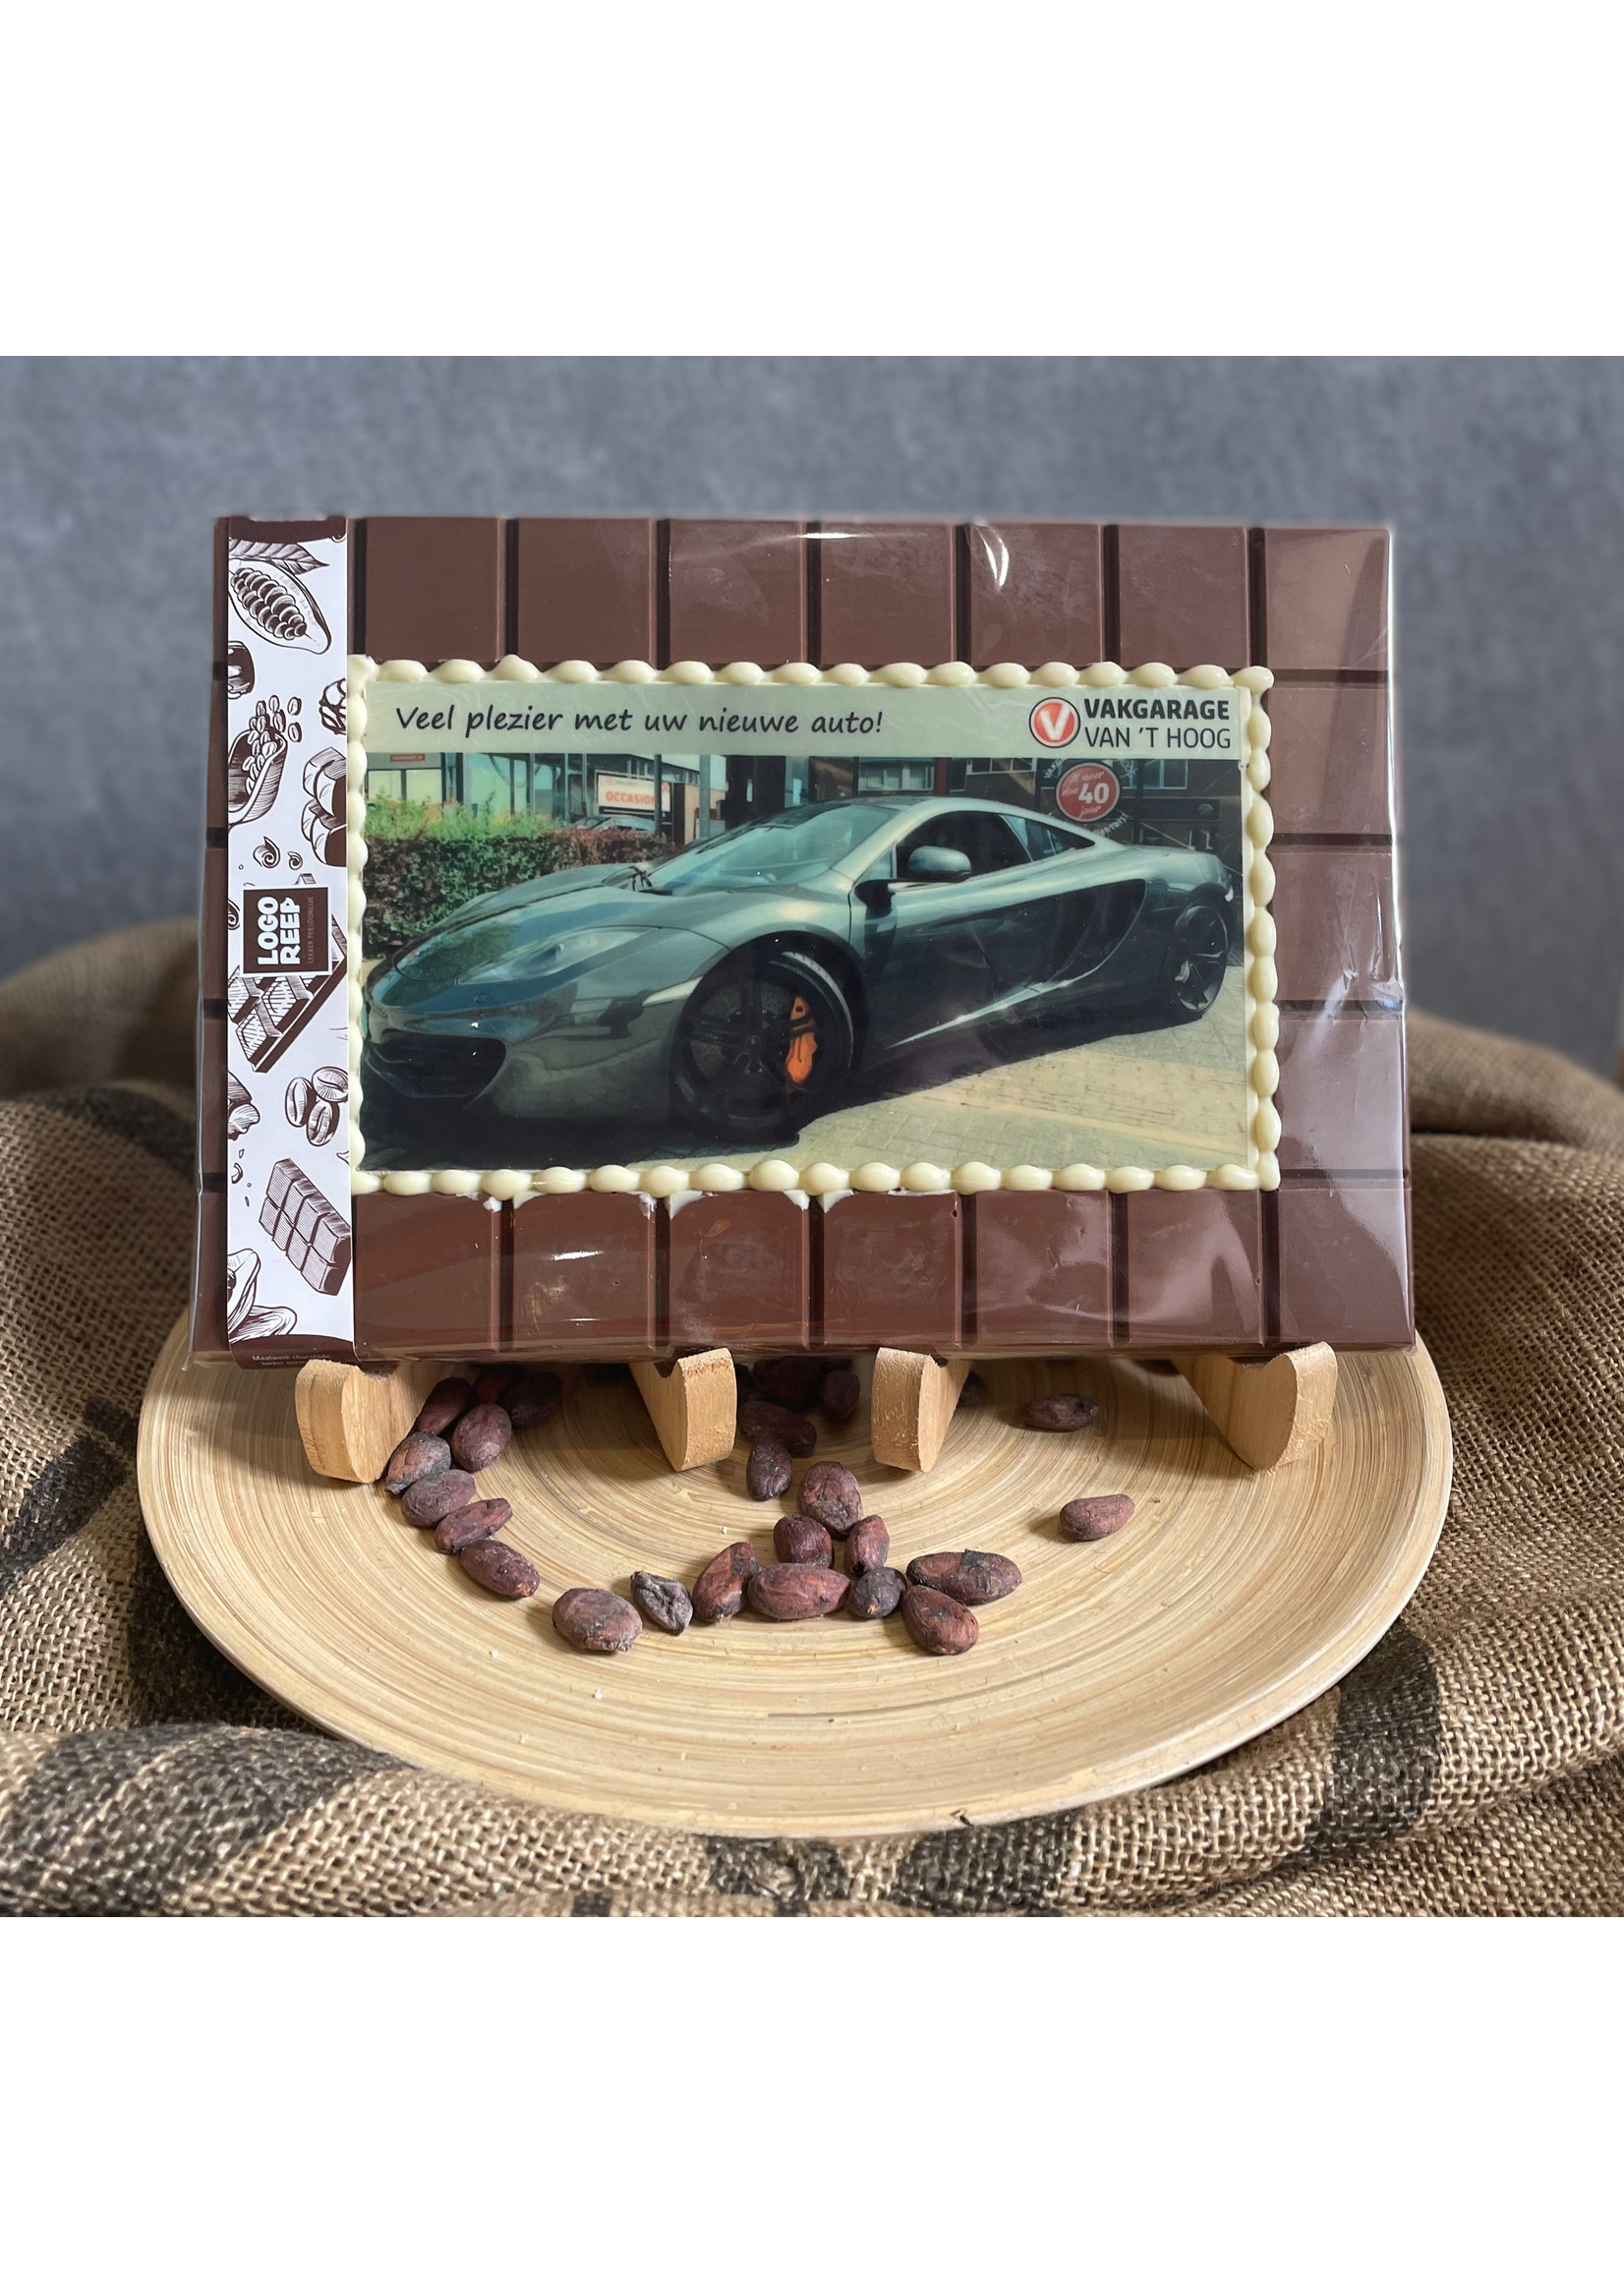 XXL chocolade tablet met print